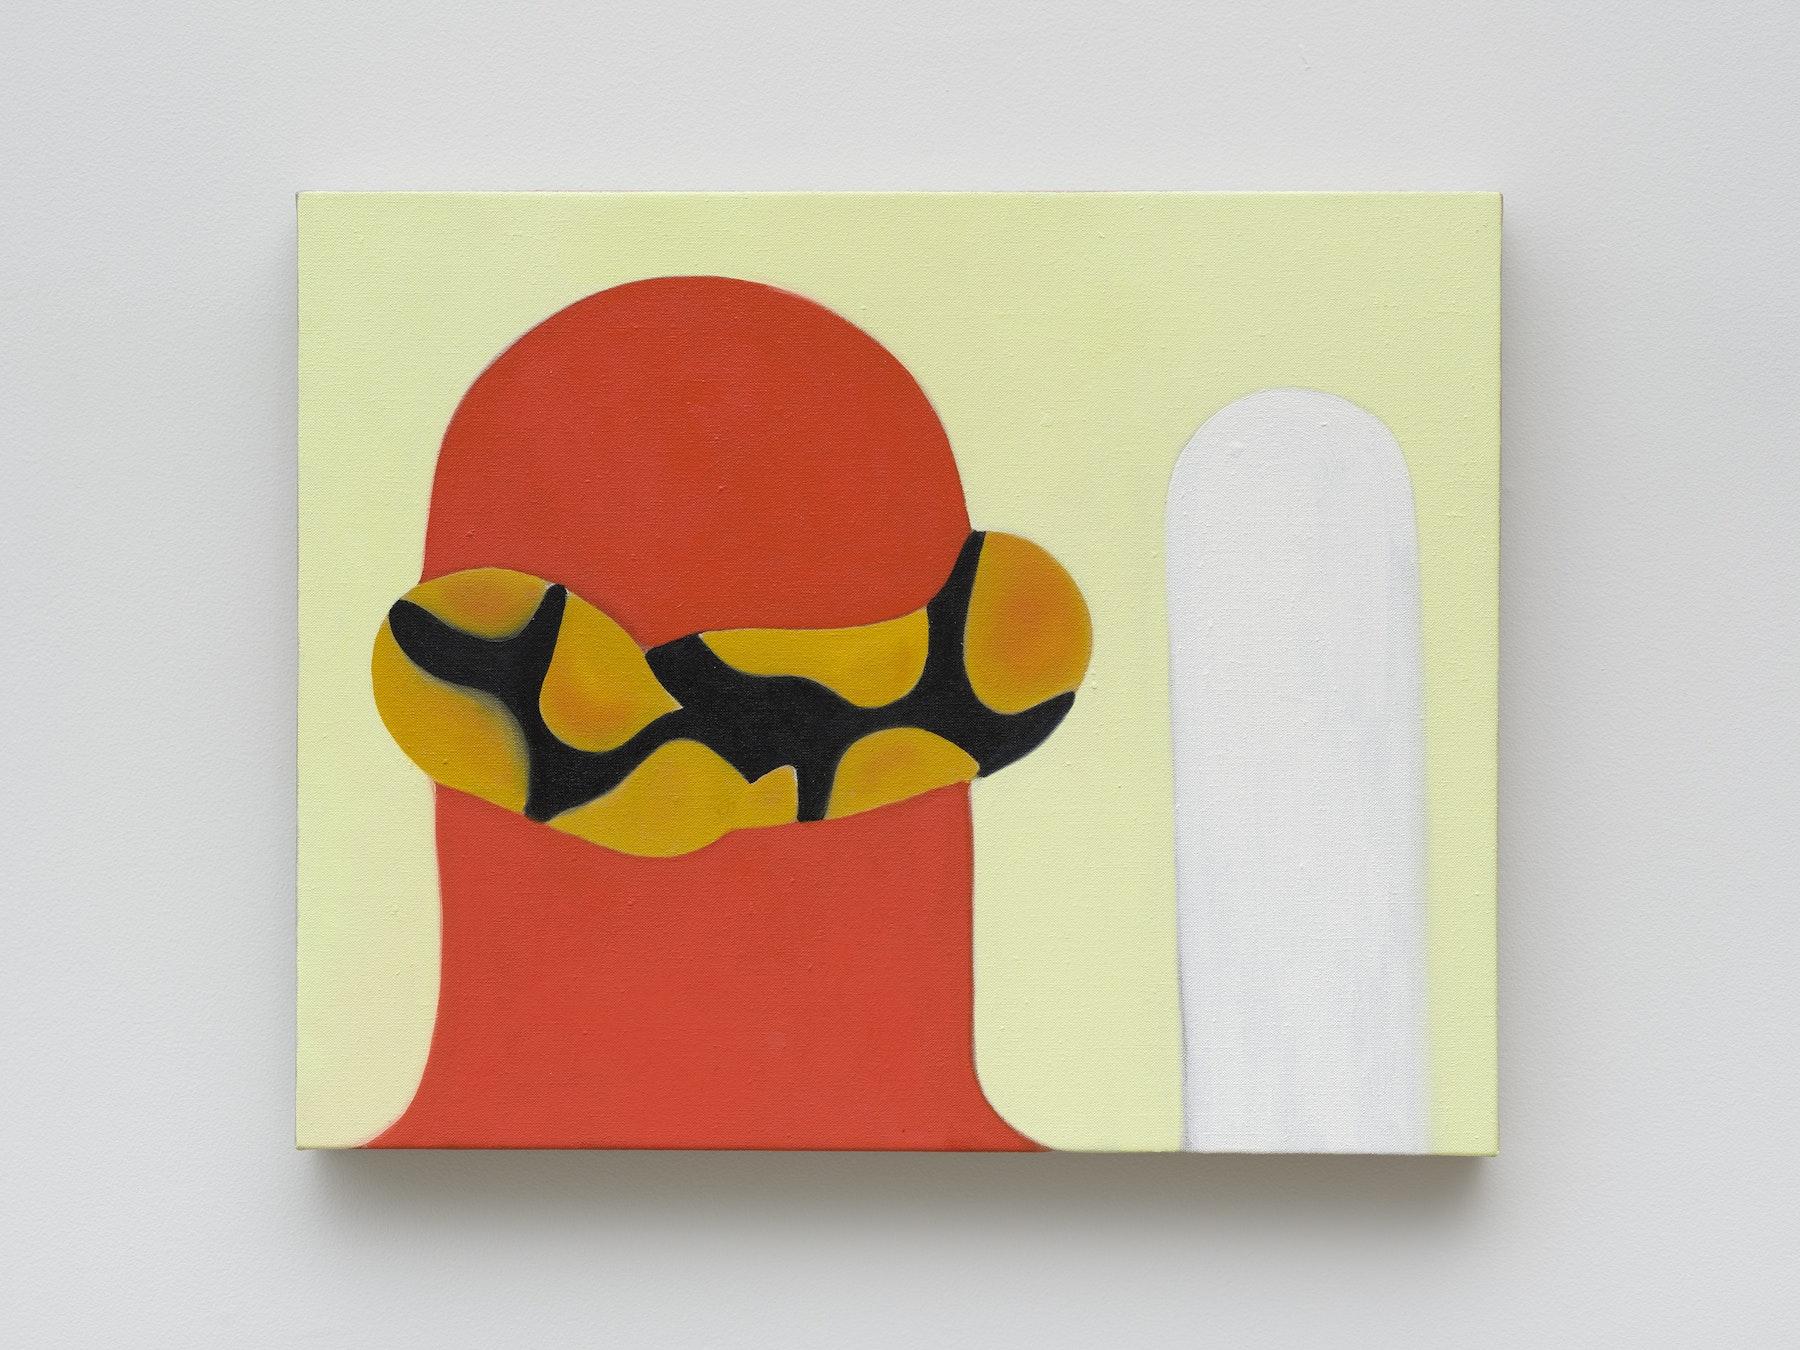 "Math Bass ""Study II,"" 2021 Oil on linen 16 x 20 x 1.5"" [HxWxD] (40.64 x 50.8 x 3.81 cm) Inventory #BAS1041 Courtesy of the artist and Vielmetter Los Angeles Photo credit: Jeff Mclane"